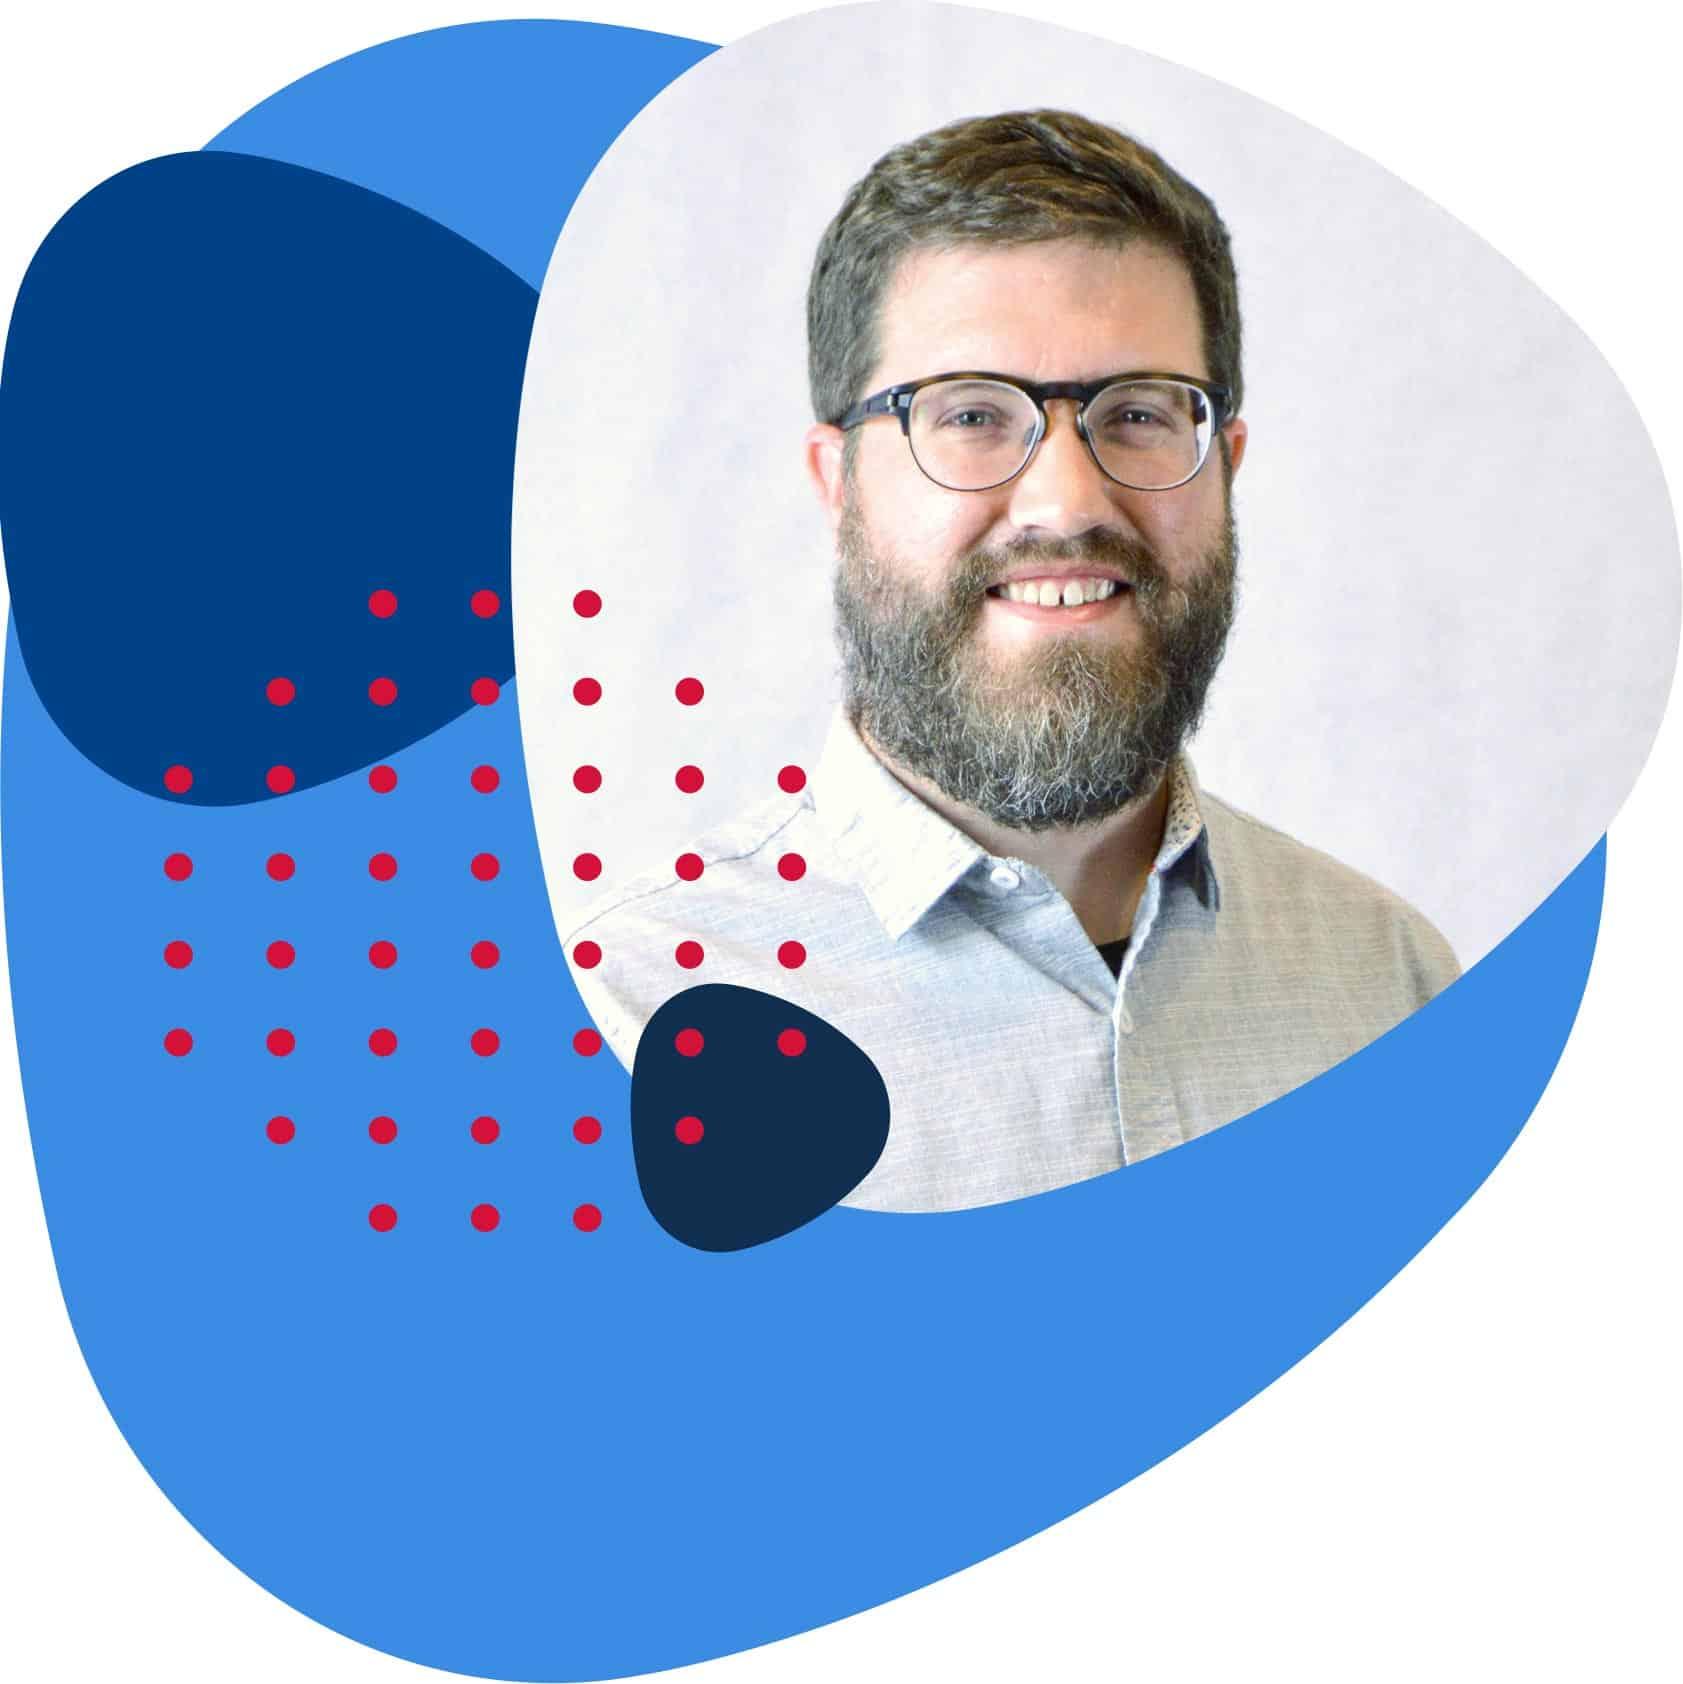 Tim Ellis, Graphic Designer, Website Developer, and Creative Marketing Consultant in Maryland.